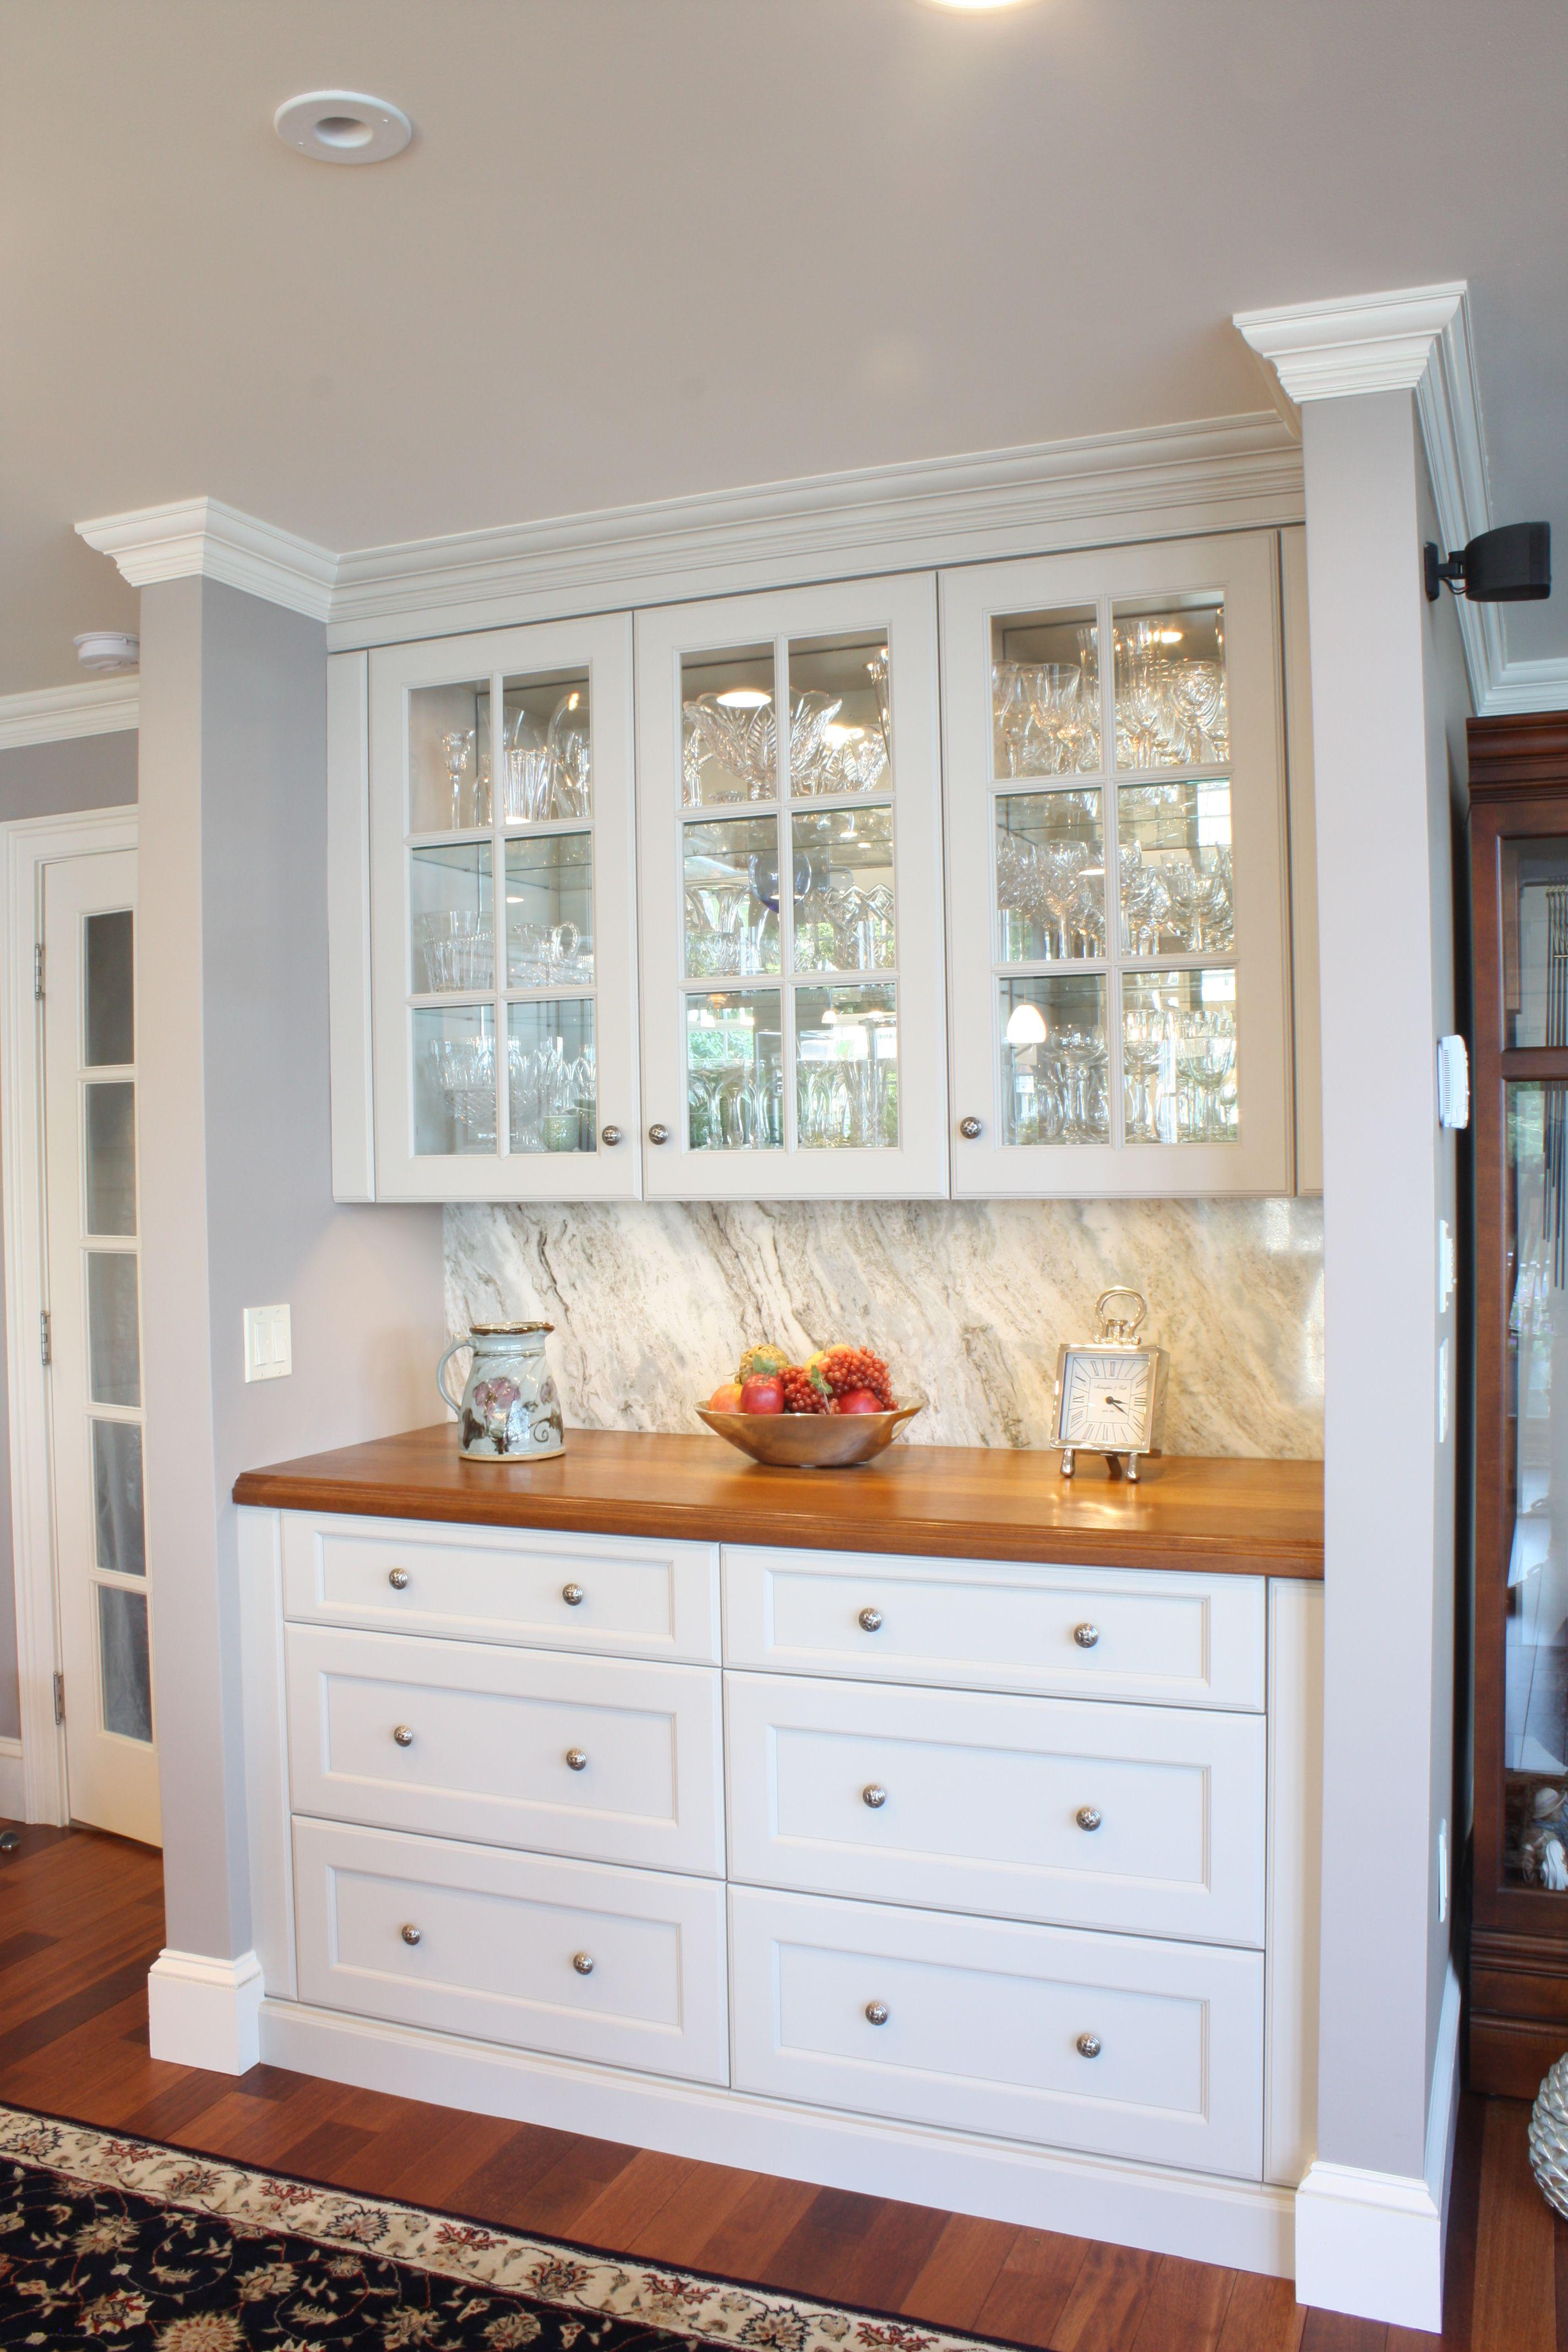 Kitchen Hutch glass display wall cabinets wood